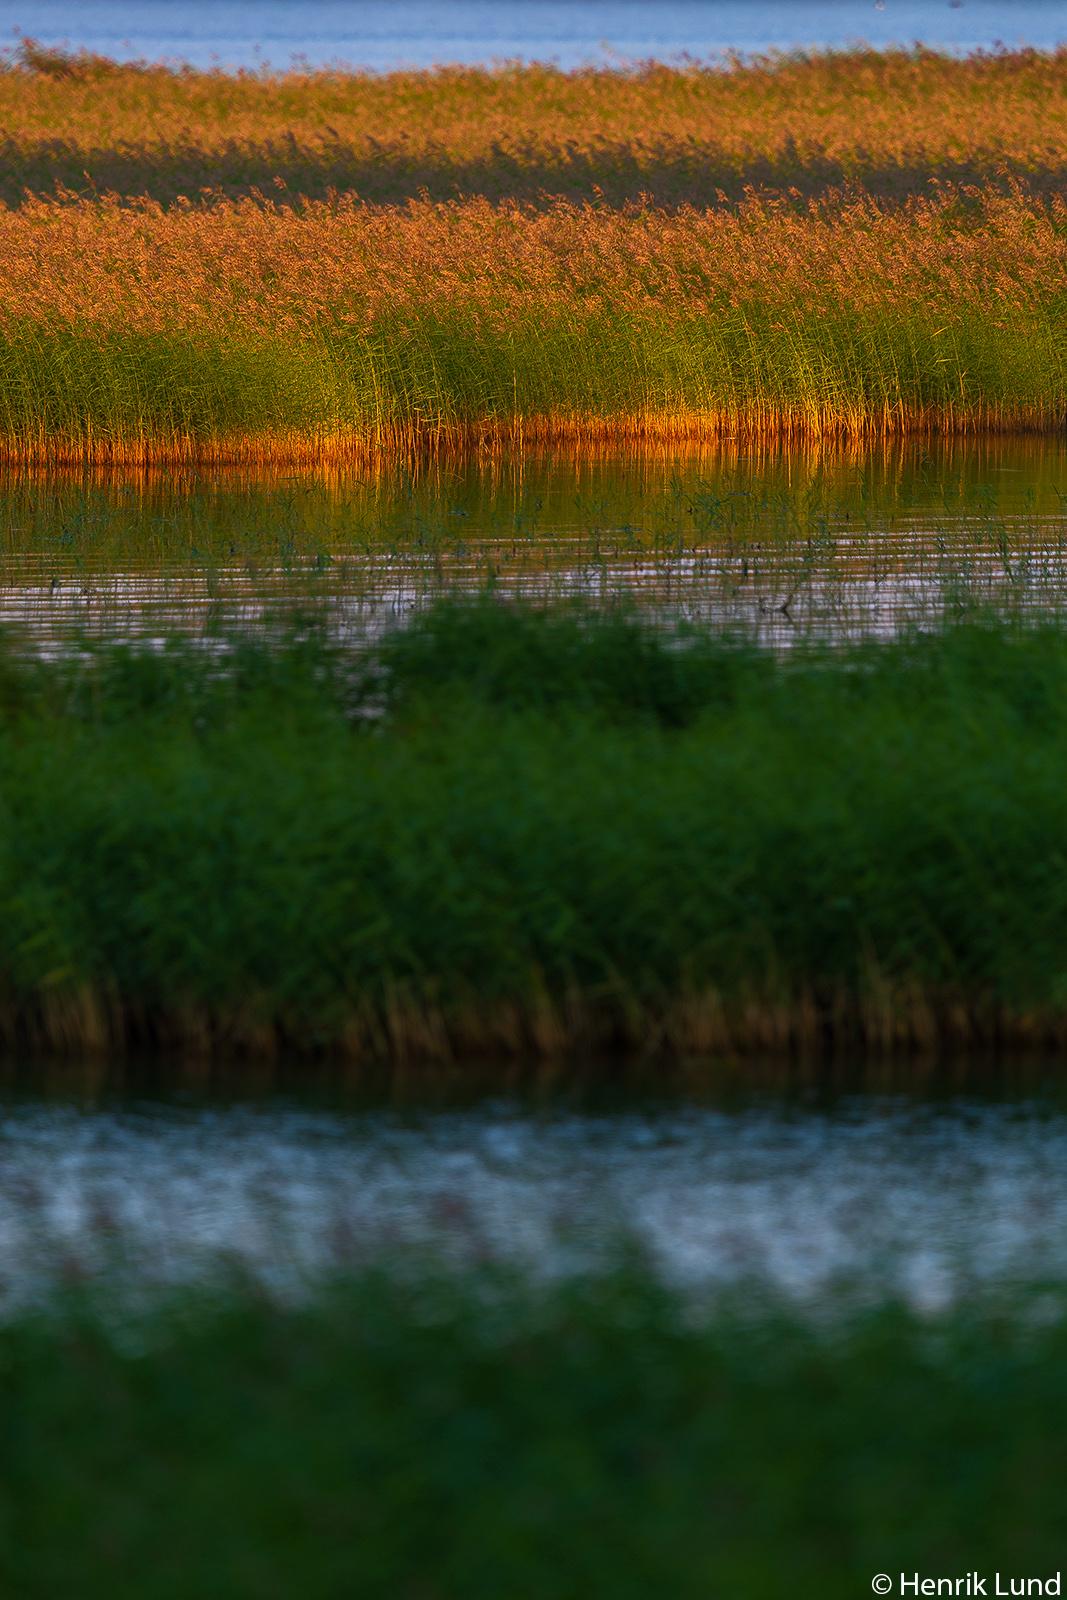 Reed in sunset. Sarvsal, Lovisa, Finland. July 2018.